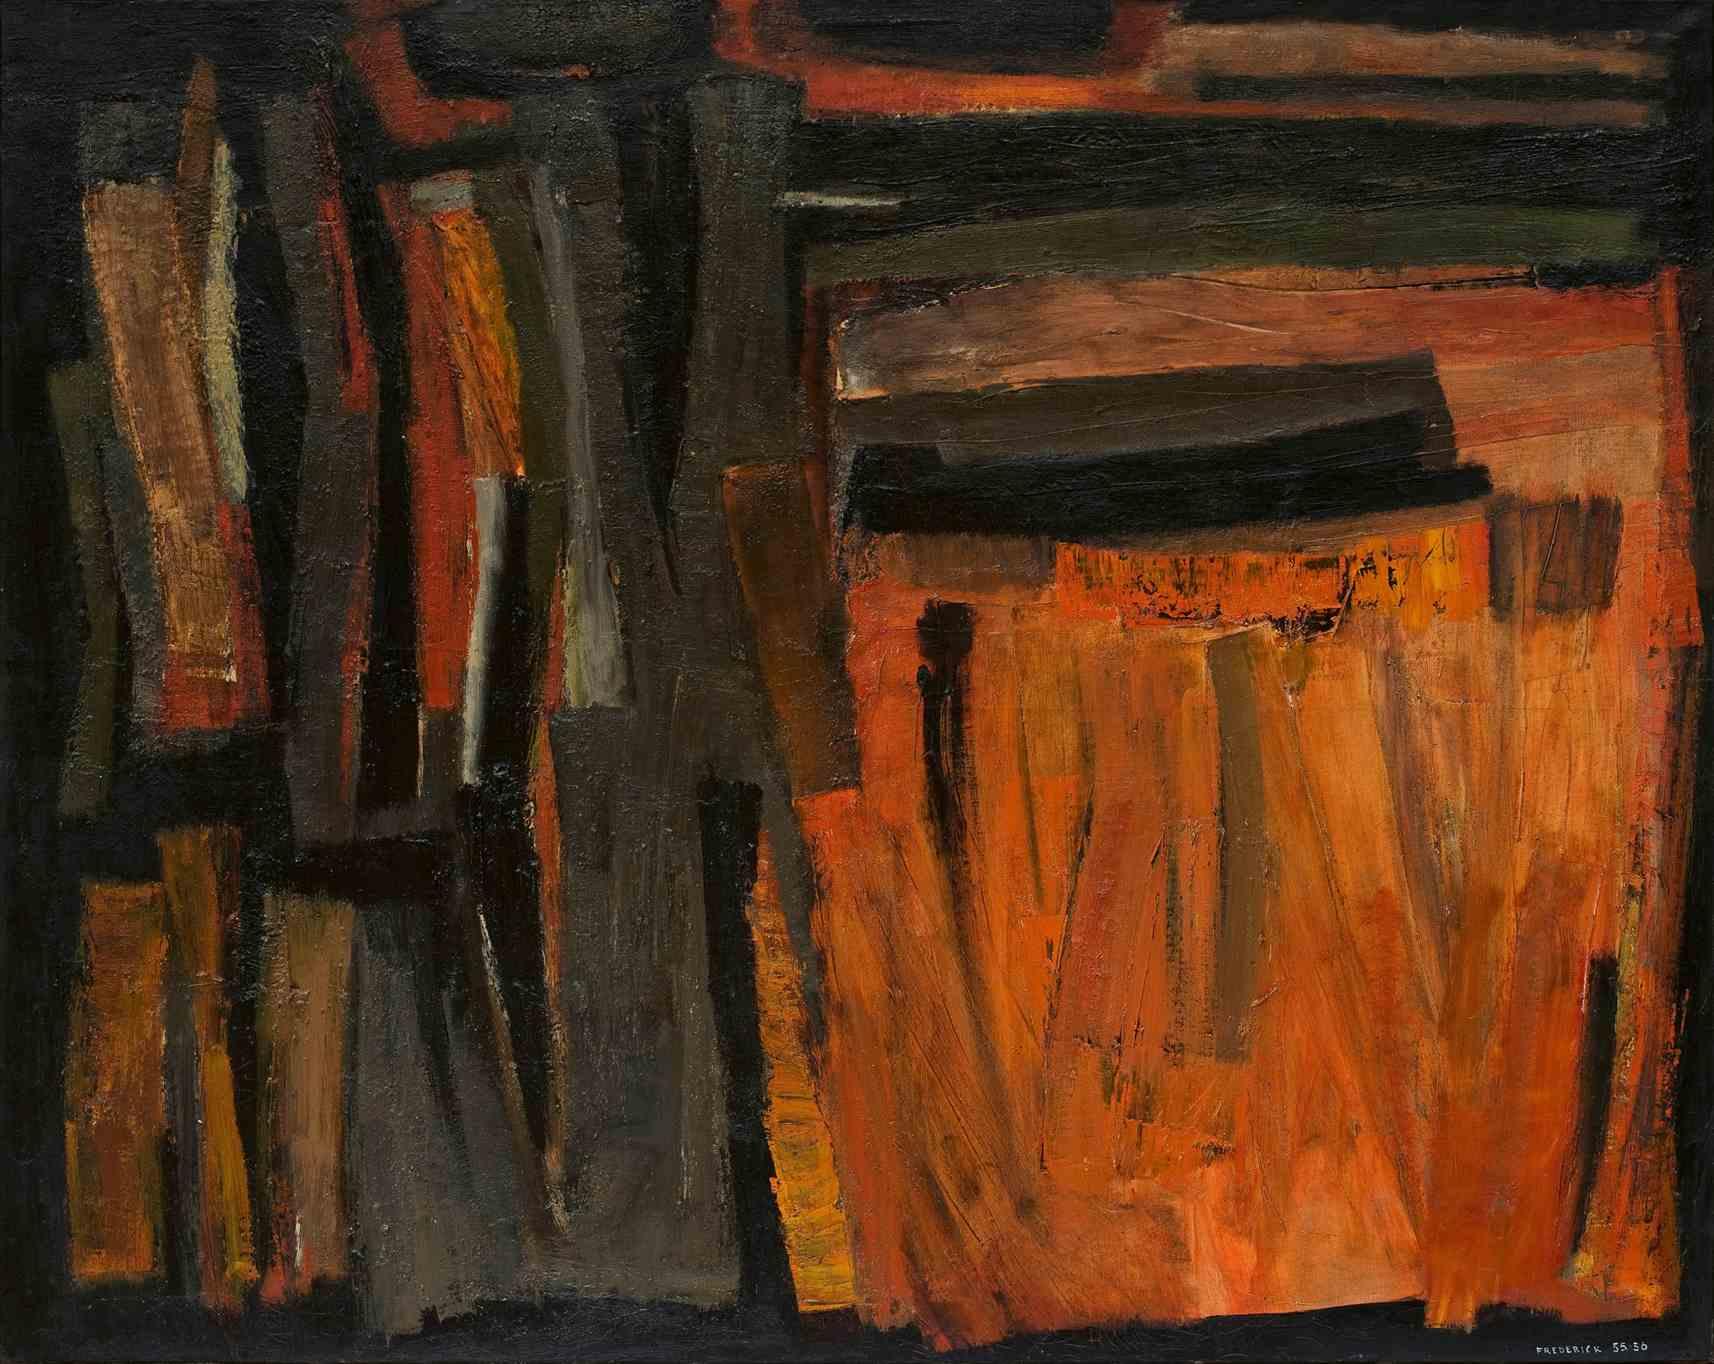 Untitled, 1955-56